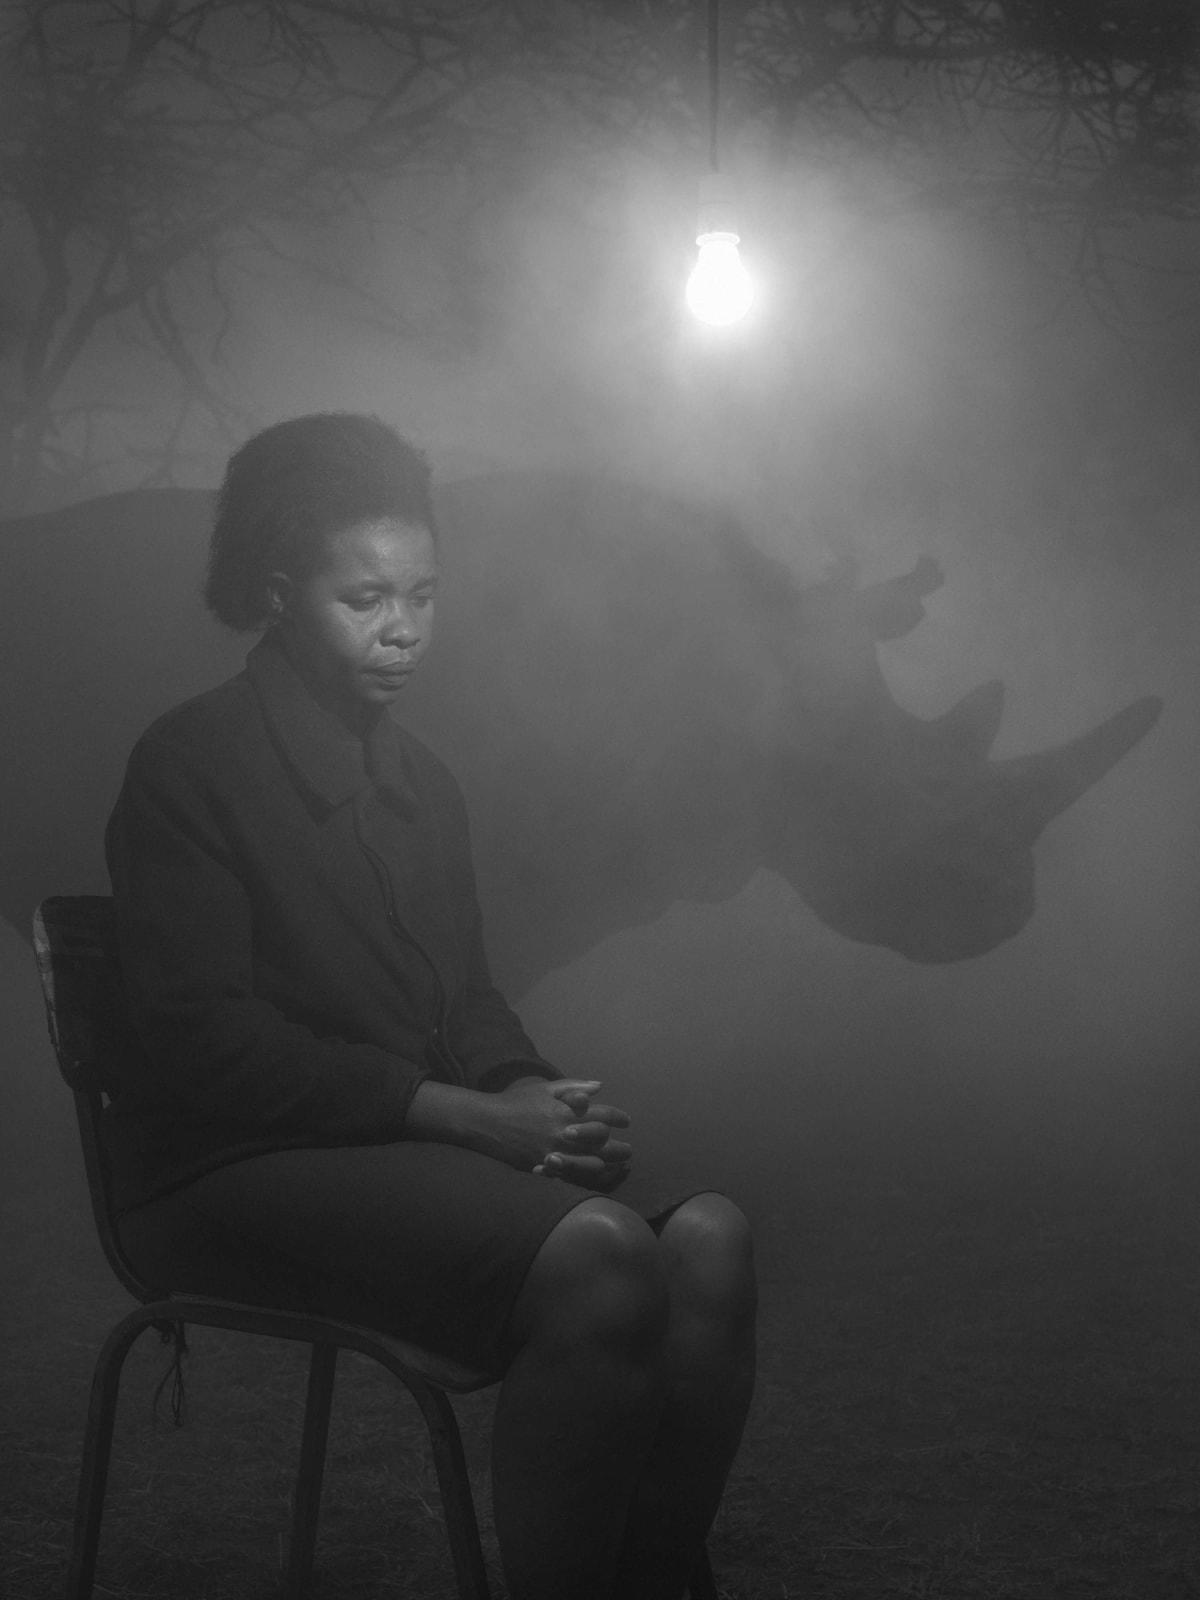 Teresa and a rhino named Najin in fog with lightbulb, Kenya, from the Day May Break series by Nick Brandt